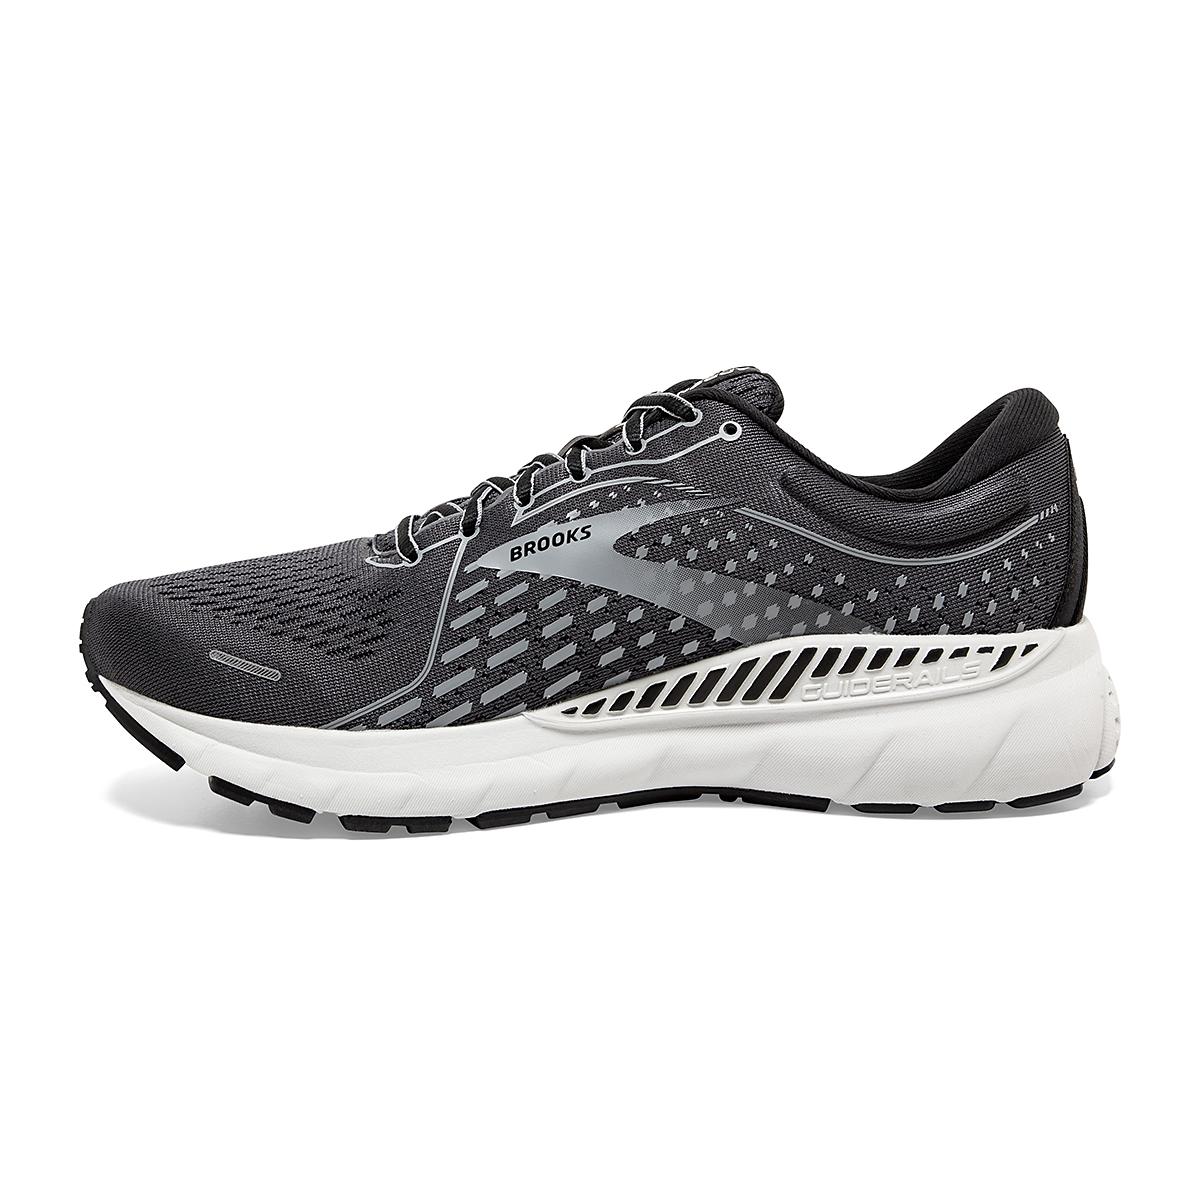 Men's Brooks Adrenaline GTS 21 Running Shoe - Color: Blackened Pearl - Size: 7 - Width: Regular, Blackened Pearl, large, image 2